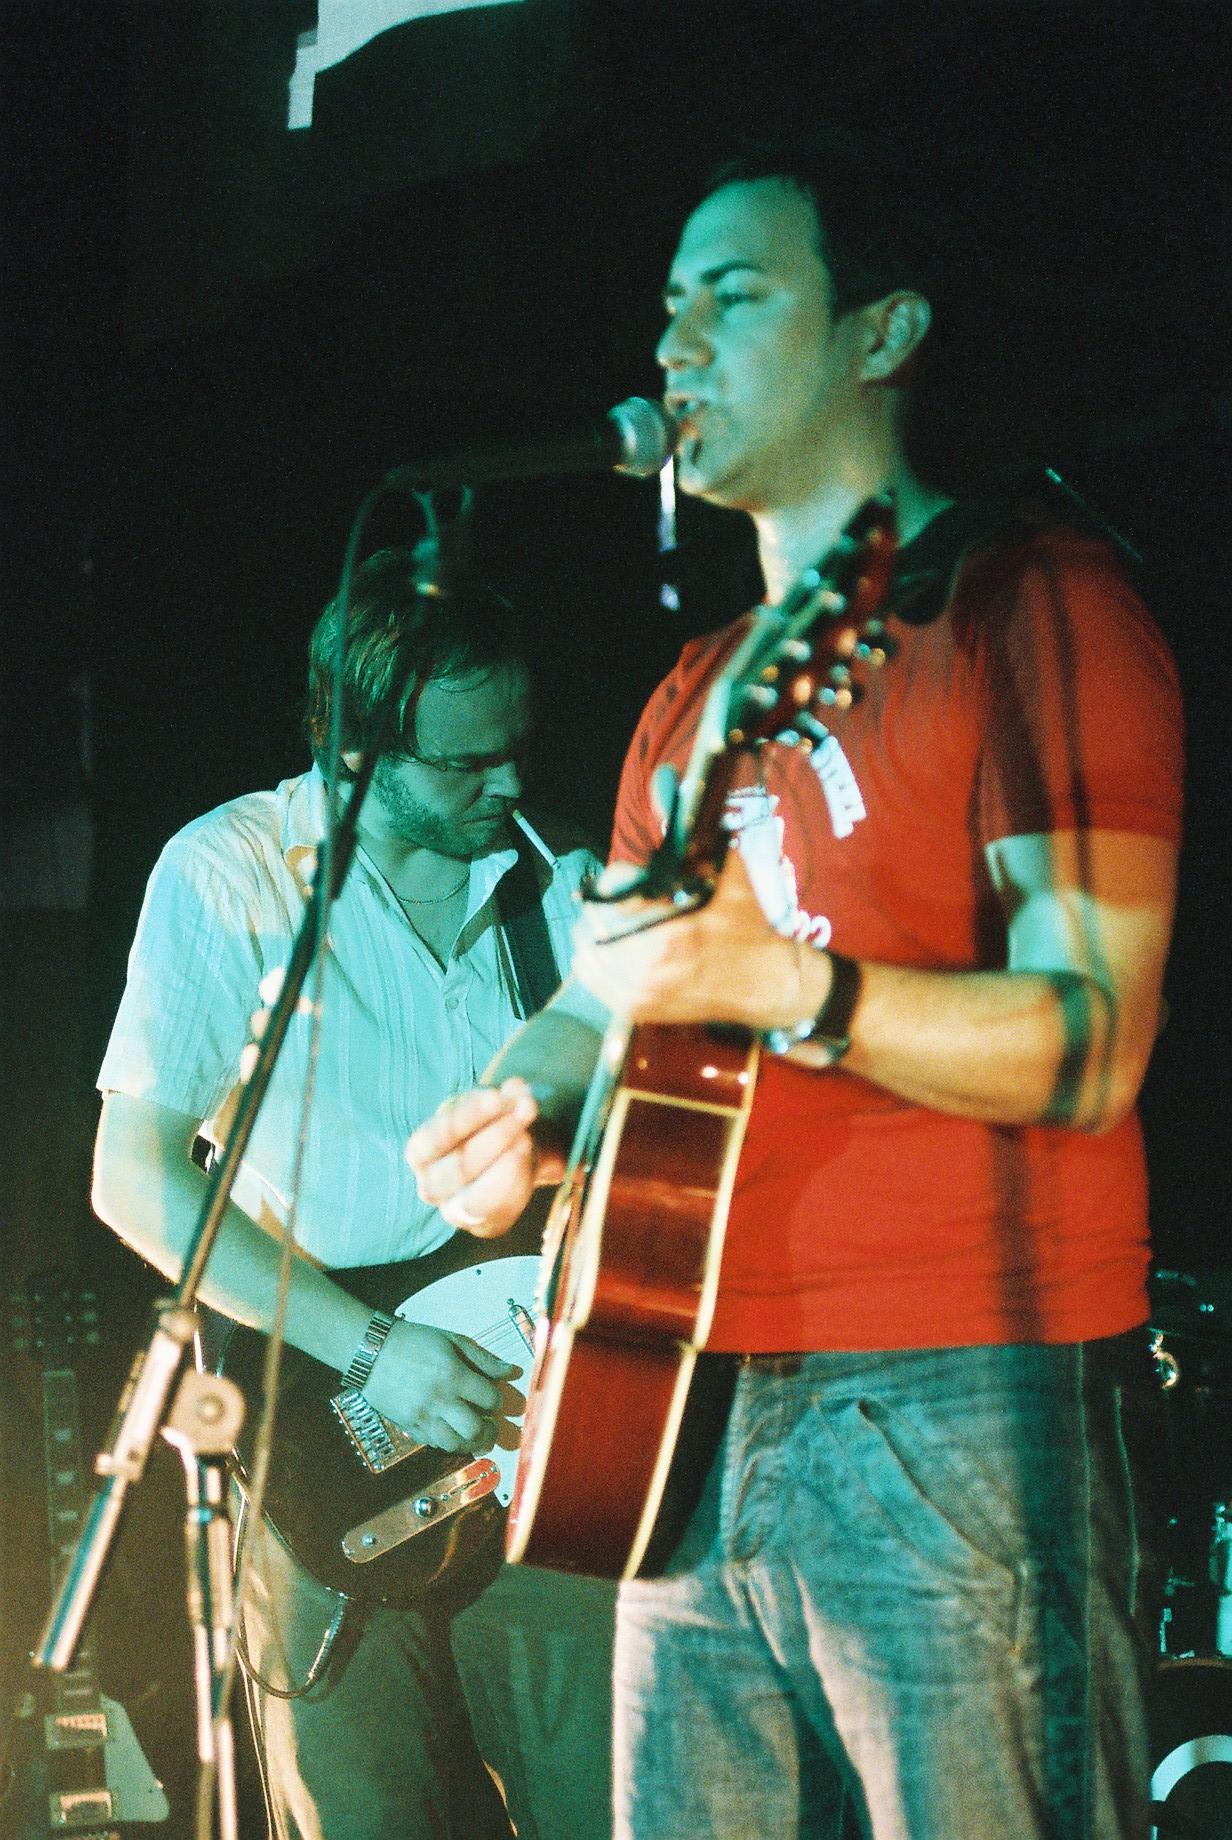 Tarkan Algin & Dean Gardner - The Dees - Showcase - Union Chapel 2004, Islington